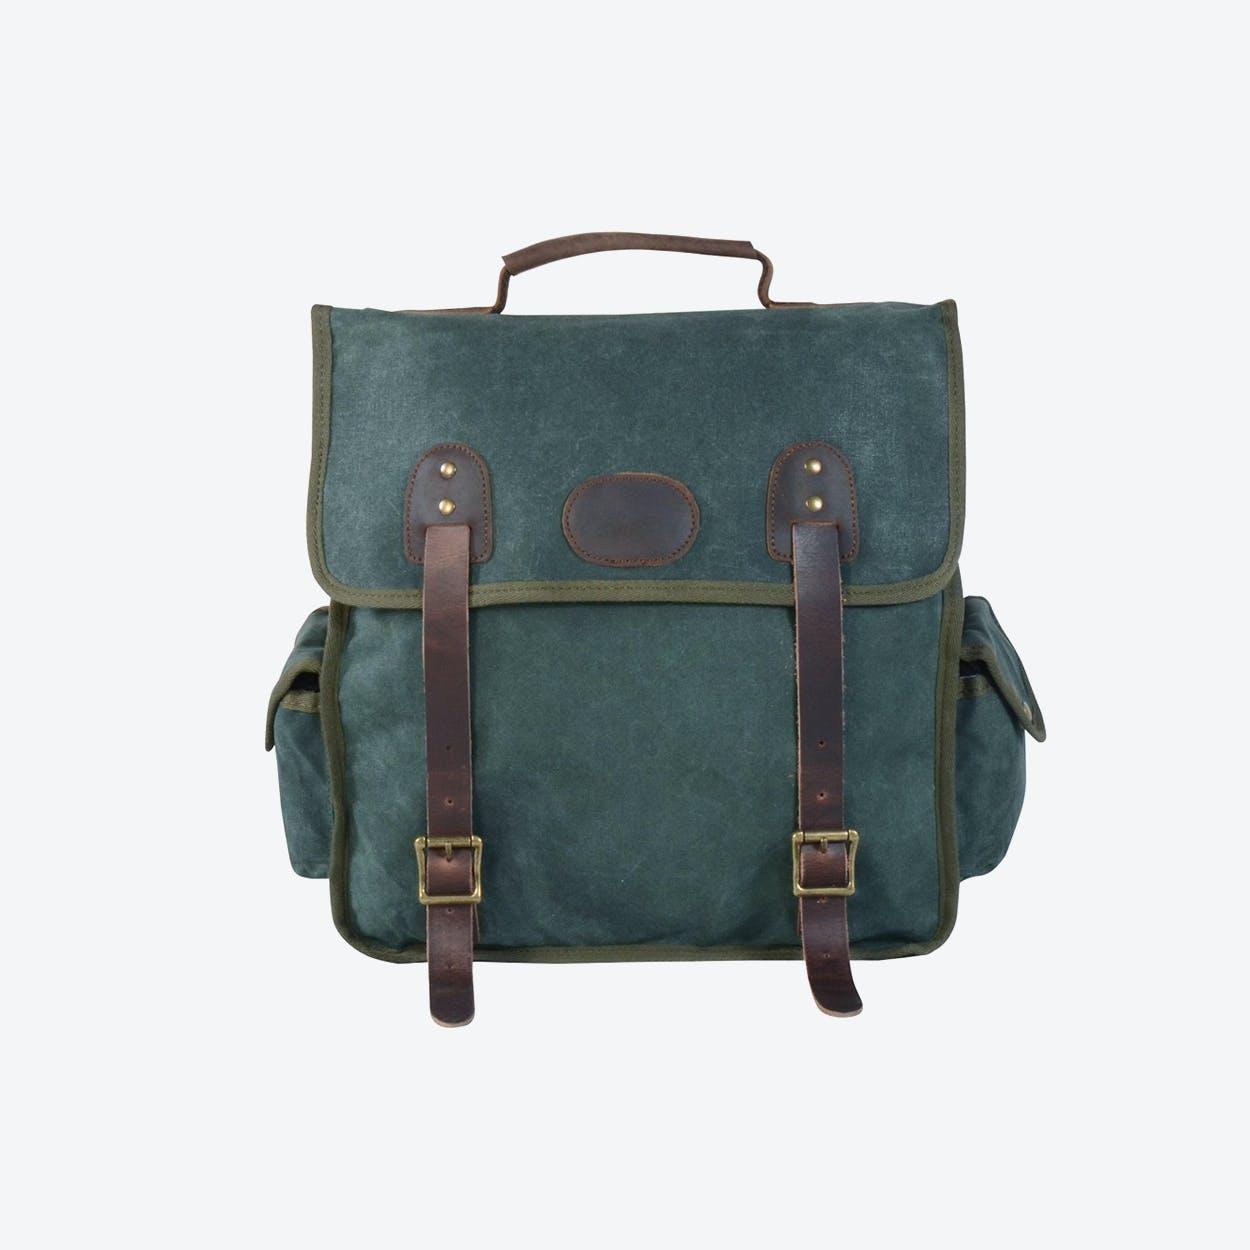 Waxed Canvas Waterproof Backpack in Postal Green